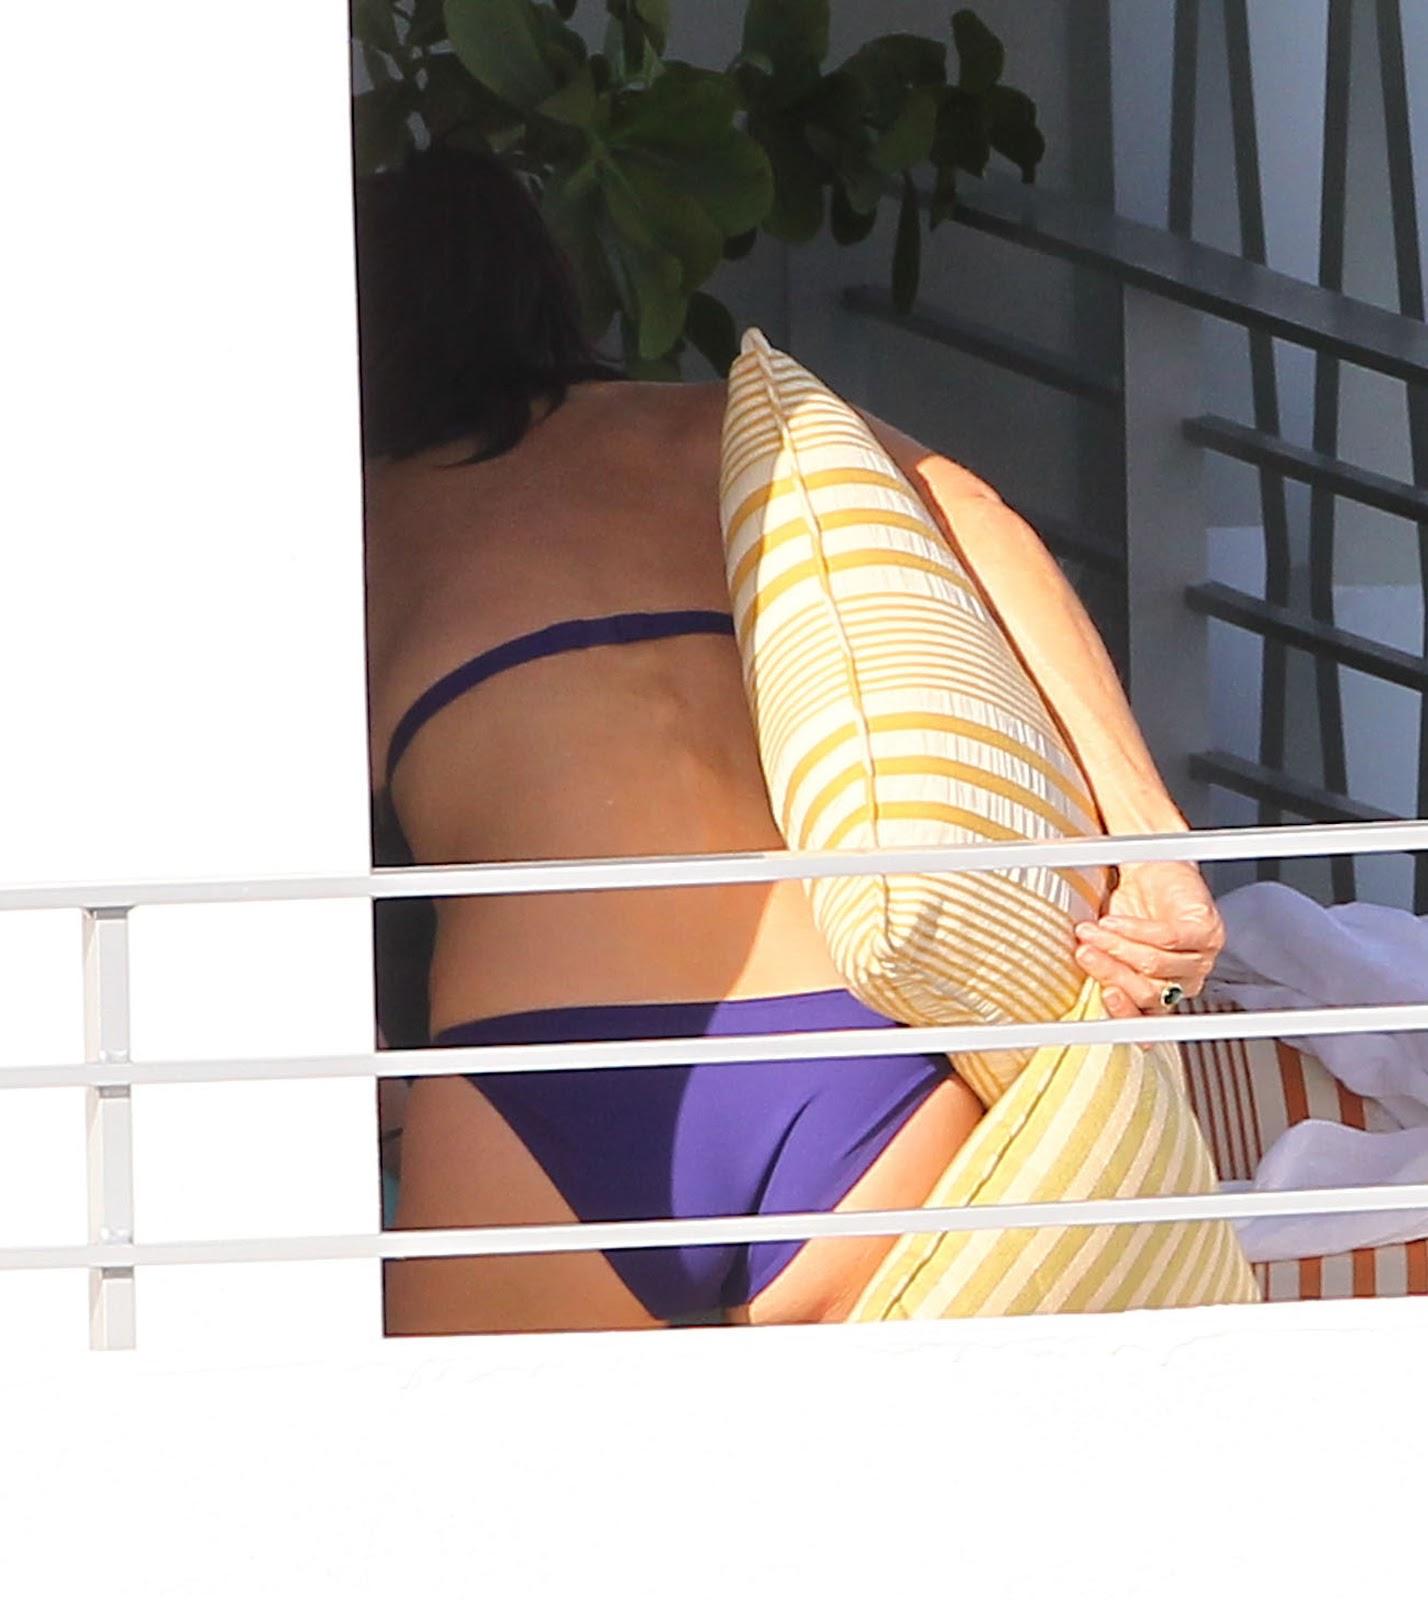 http://1.bp.blogspot.com/-PHbYNquMhZ4/UK38C1f9-GI/AAAAAAAAOfk/kd0mgXB_Wt0/s1600/courteney_cox_bikini_2012_4.jpg